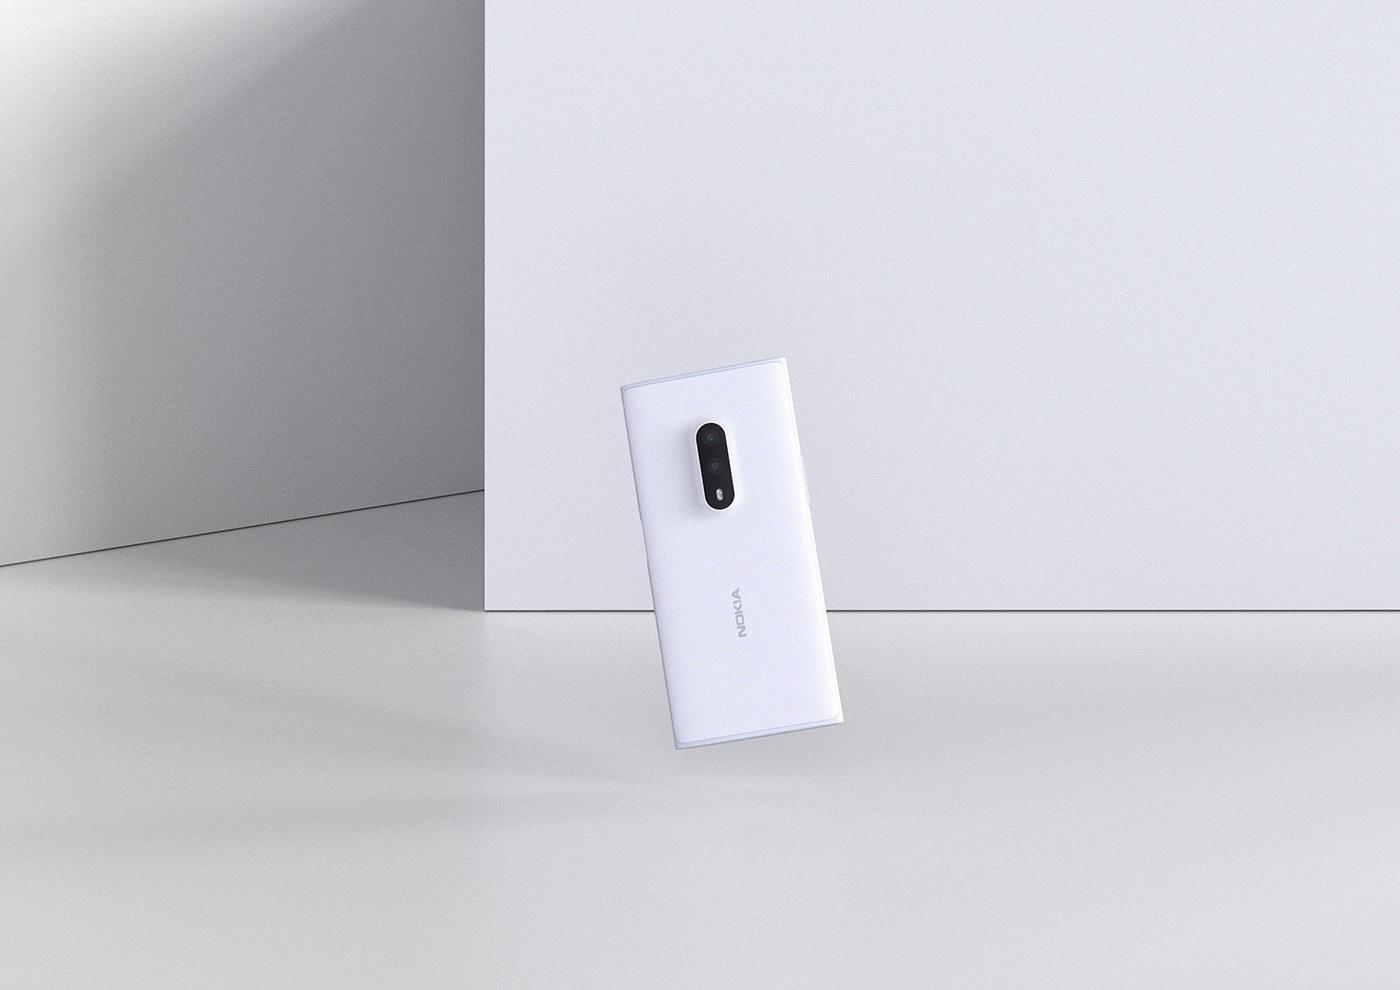 Nokia-Lumia-concept-3.jpg